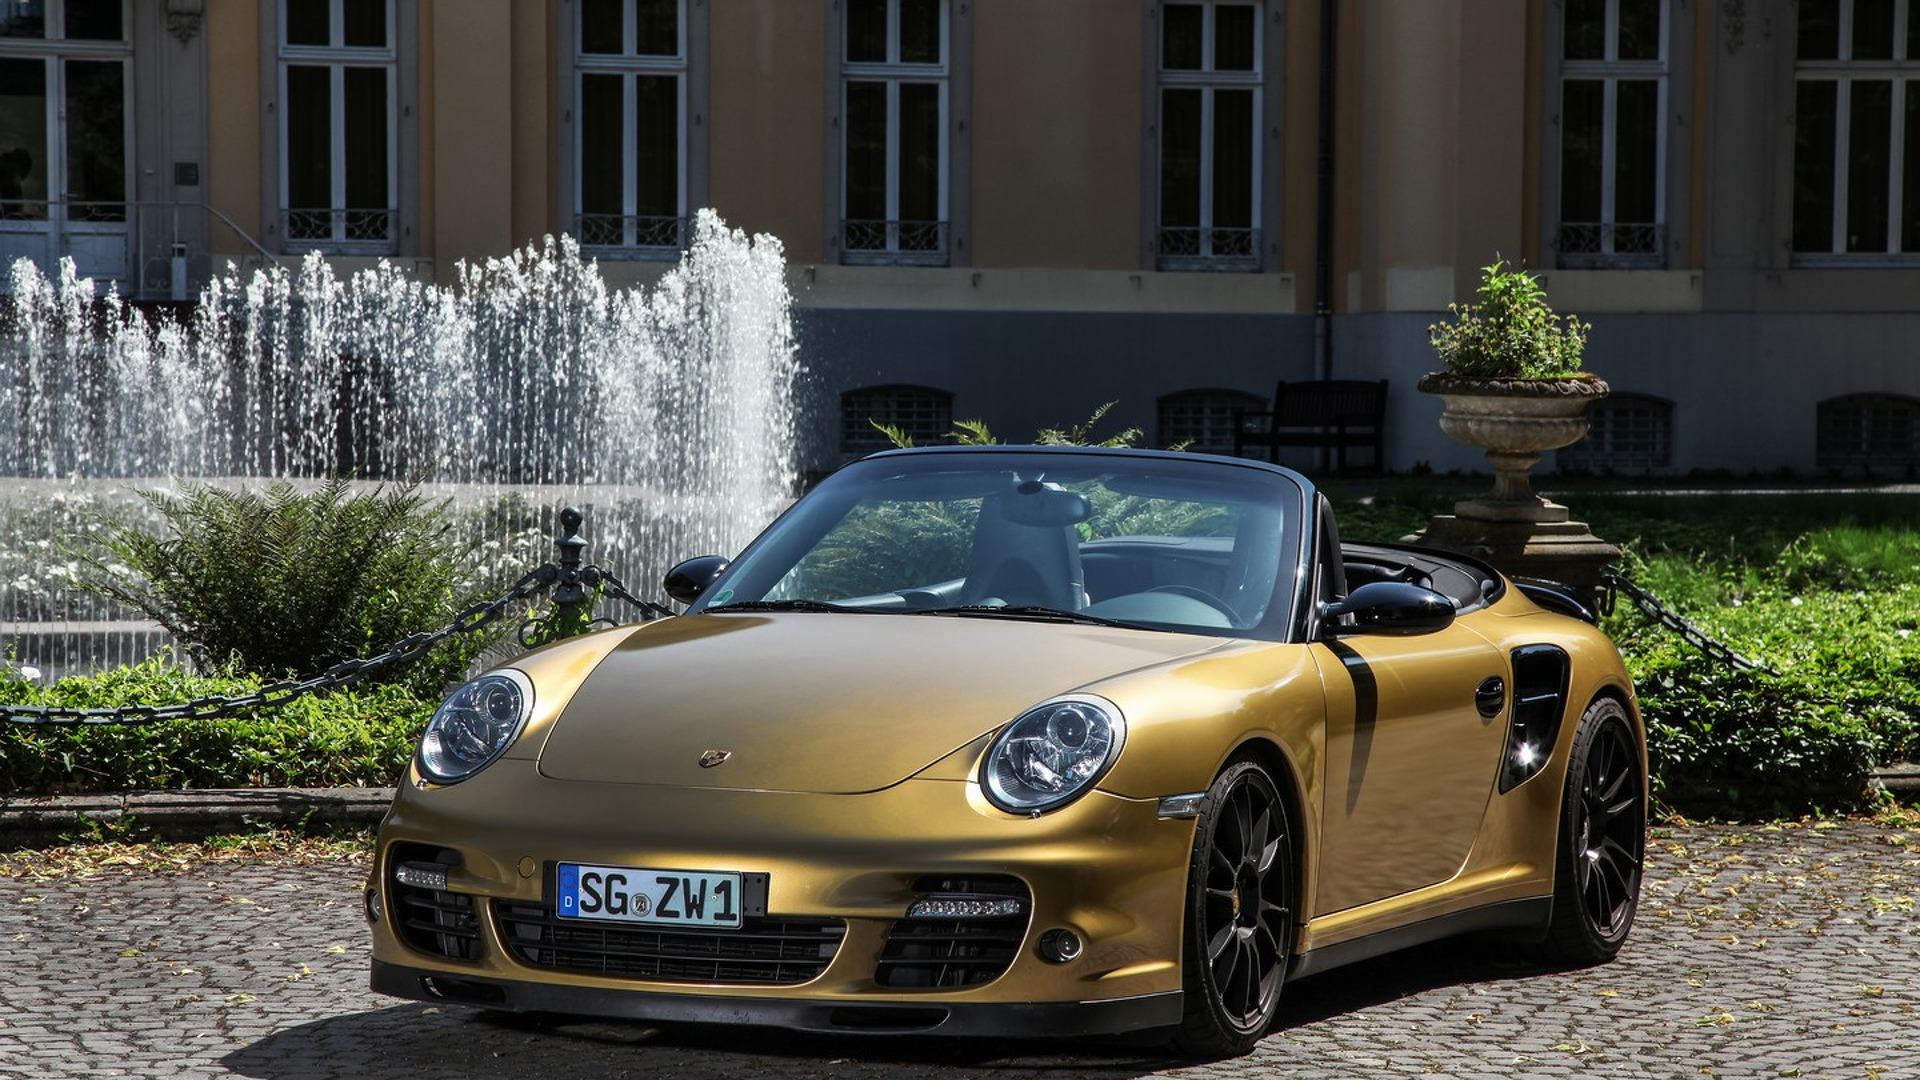 Modified Porsche 911 Turbo joins 800+ hp club